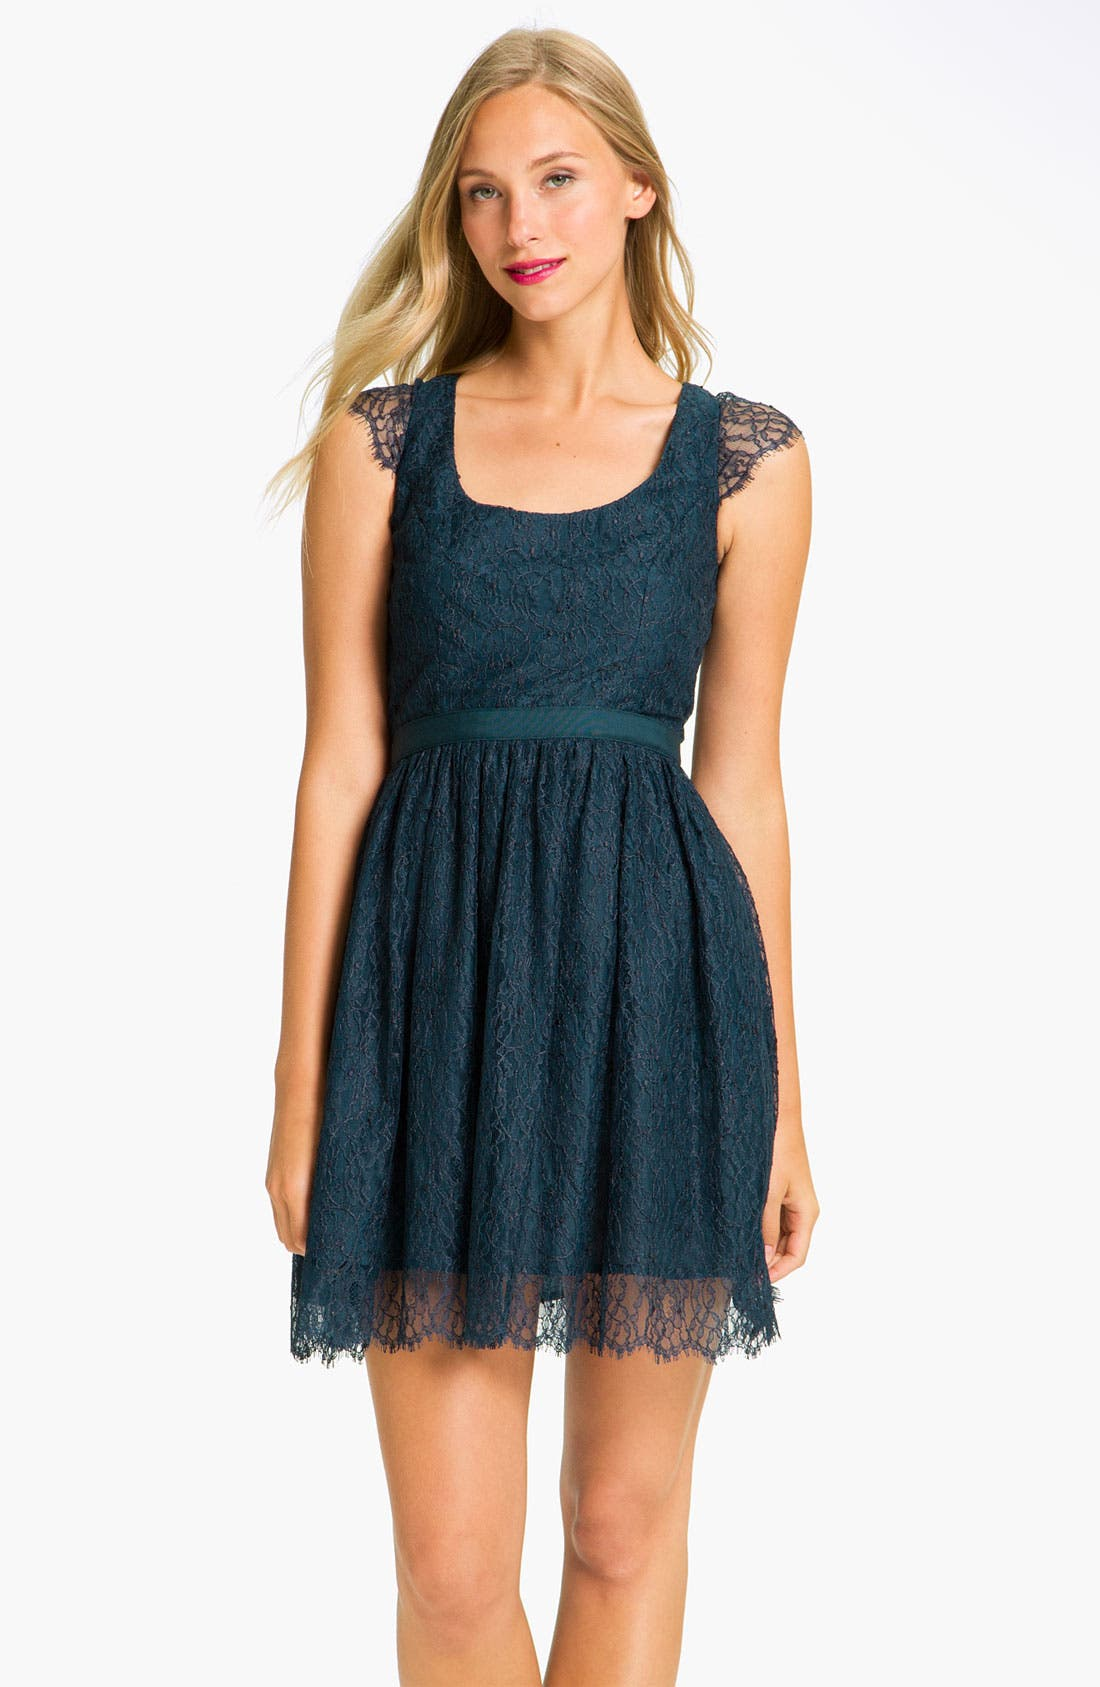 Alternate Image 1 Selected - Shoshanna 'Risa' Cap Sleeve Chantilly Lace Dress